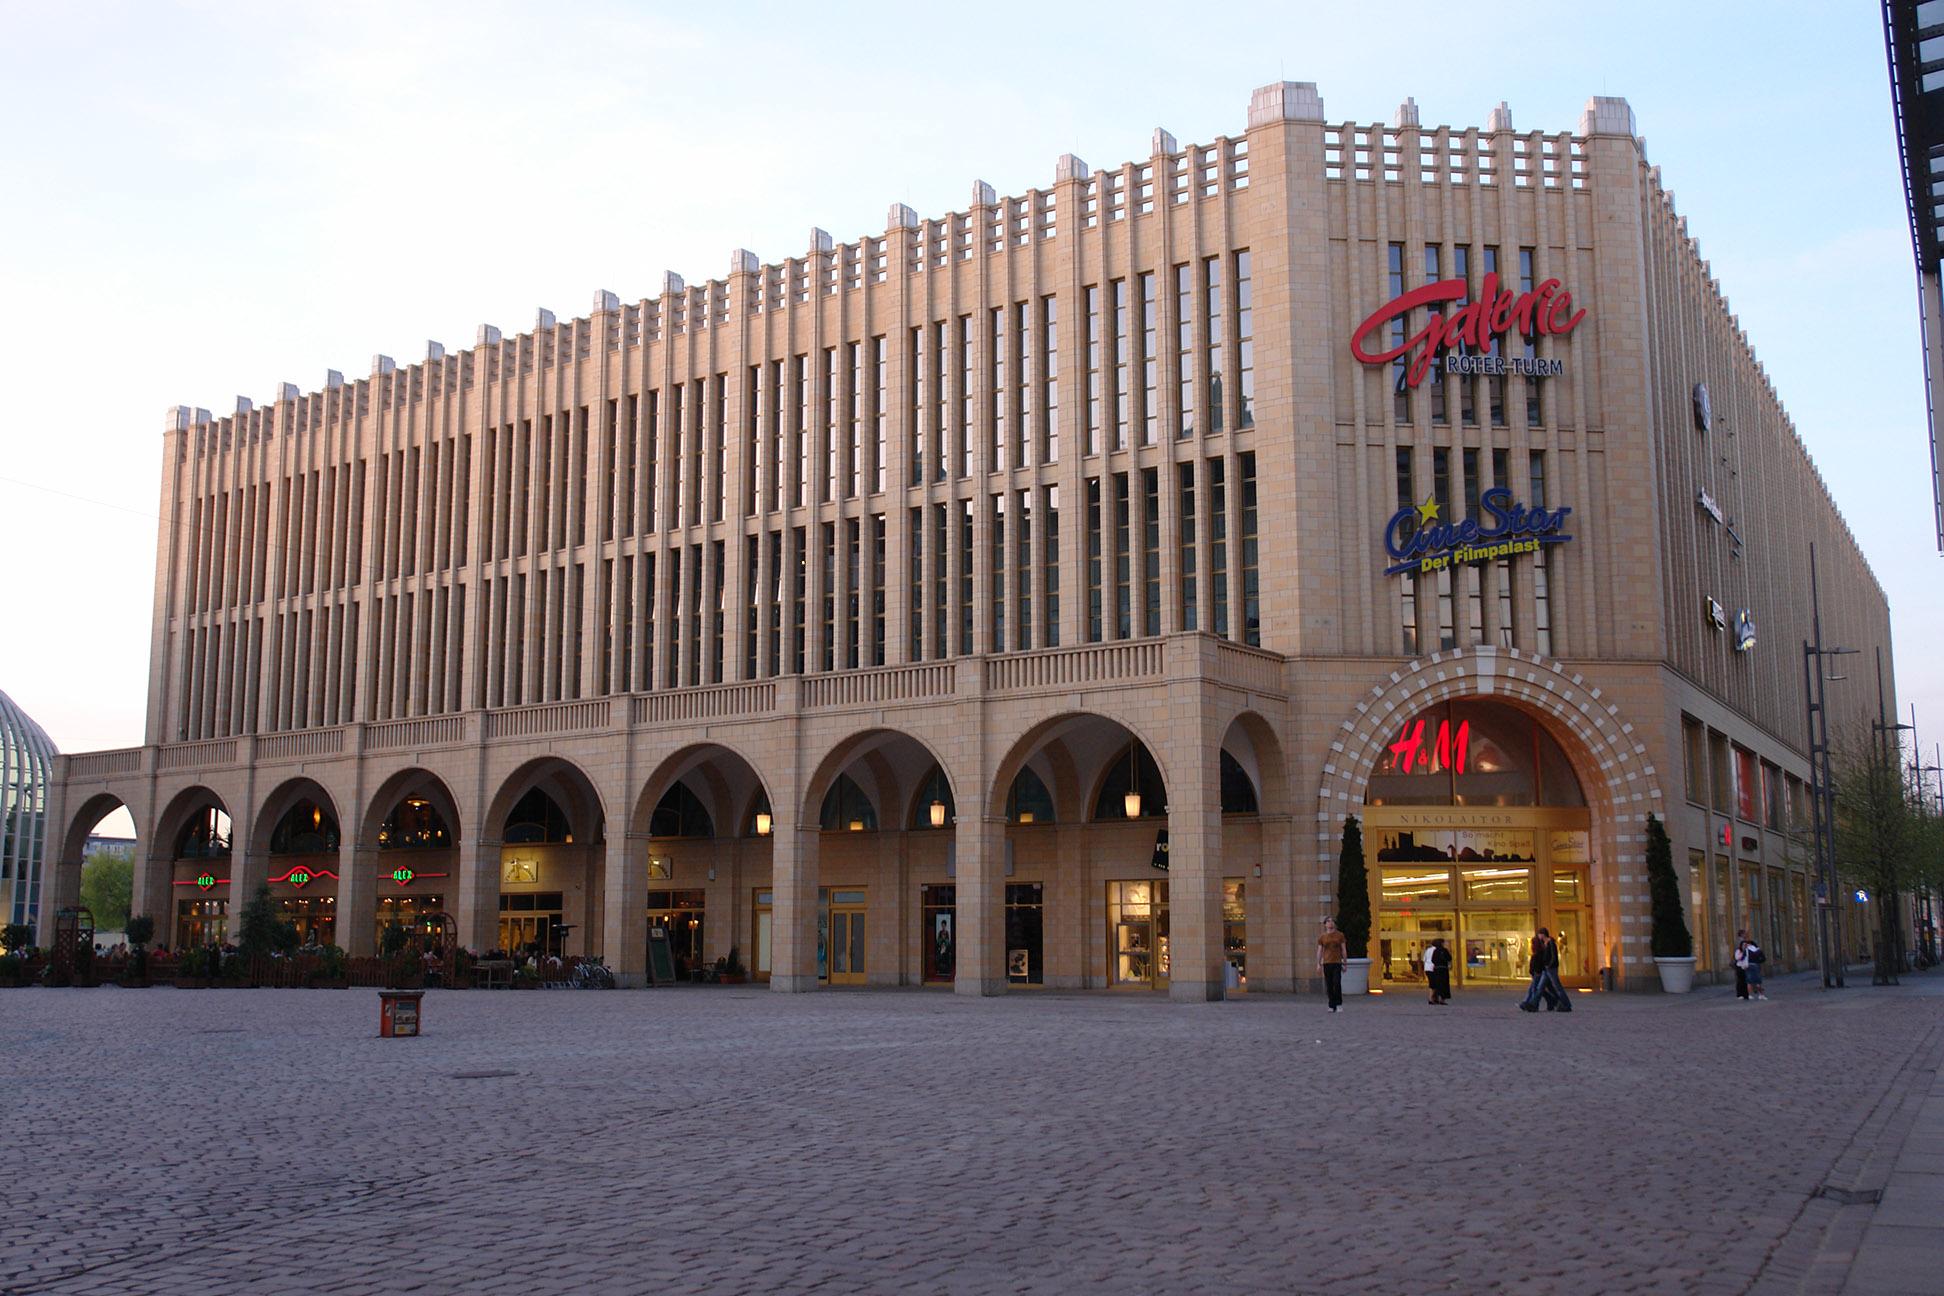 Cinestar Roter Turm Chemnitz Kinoprogramm